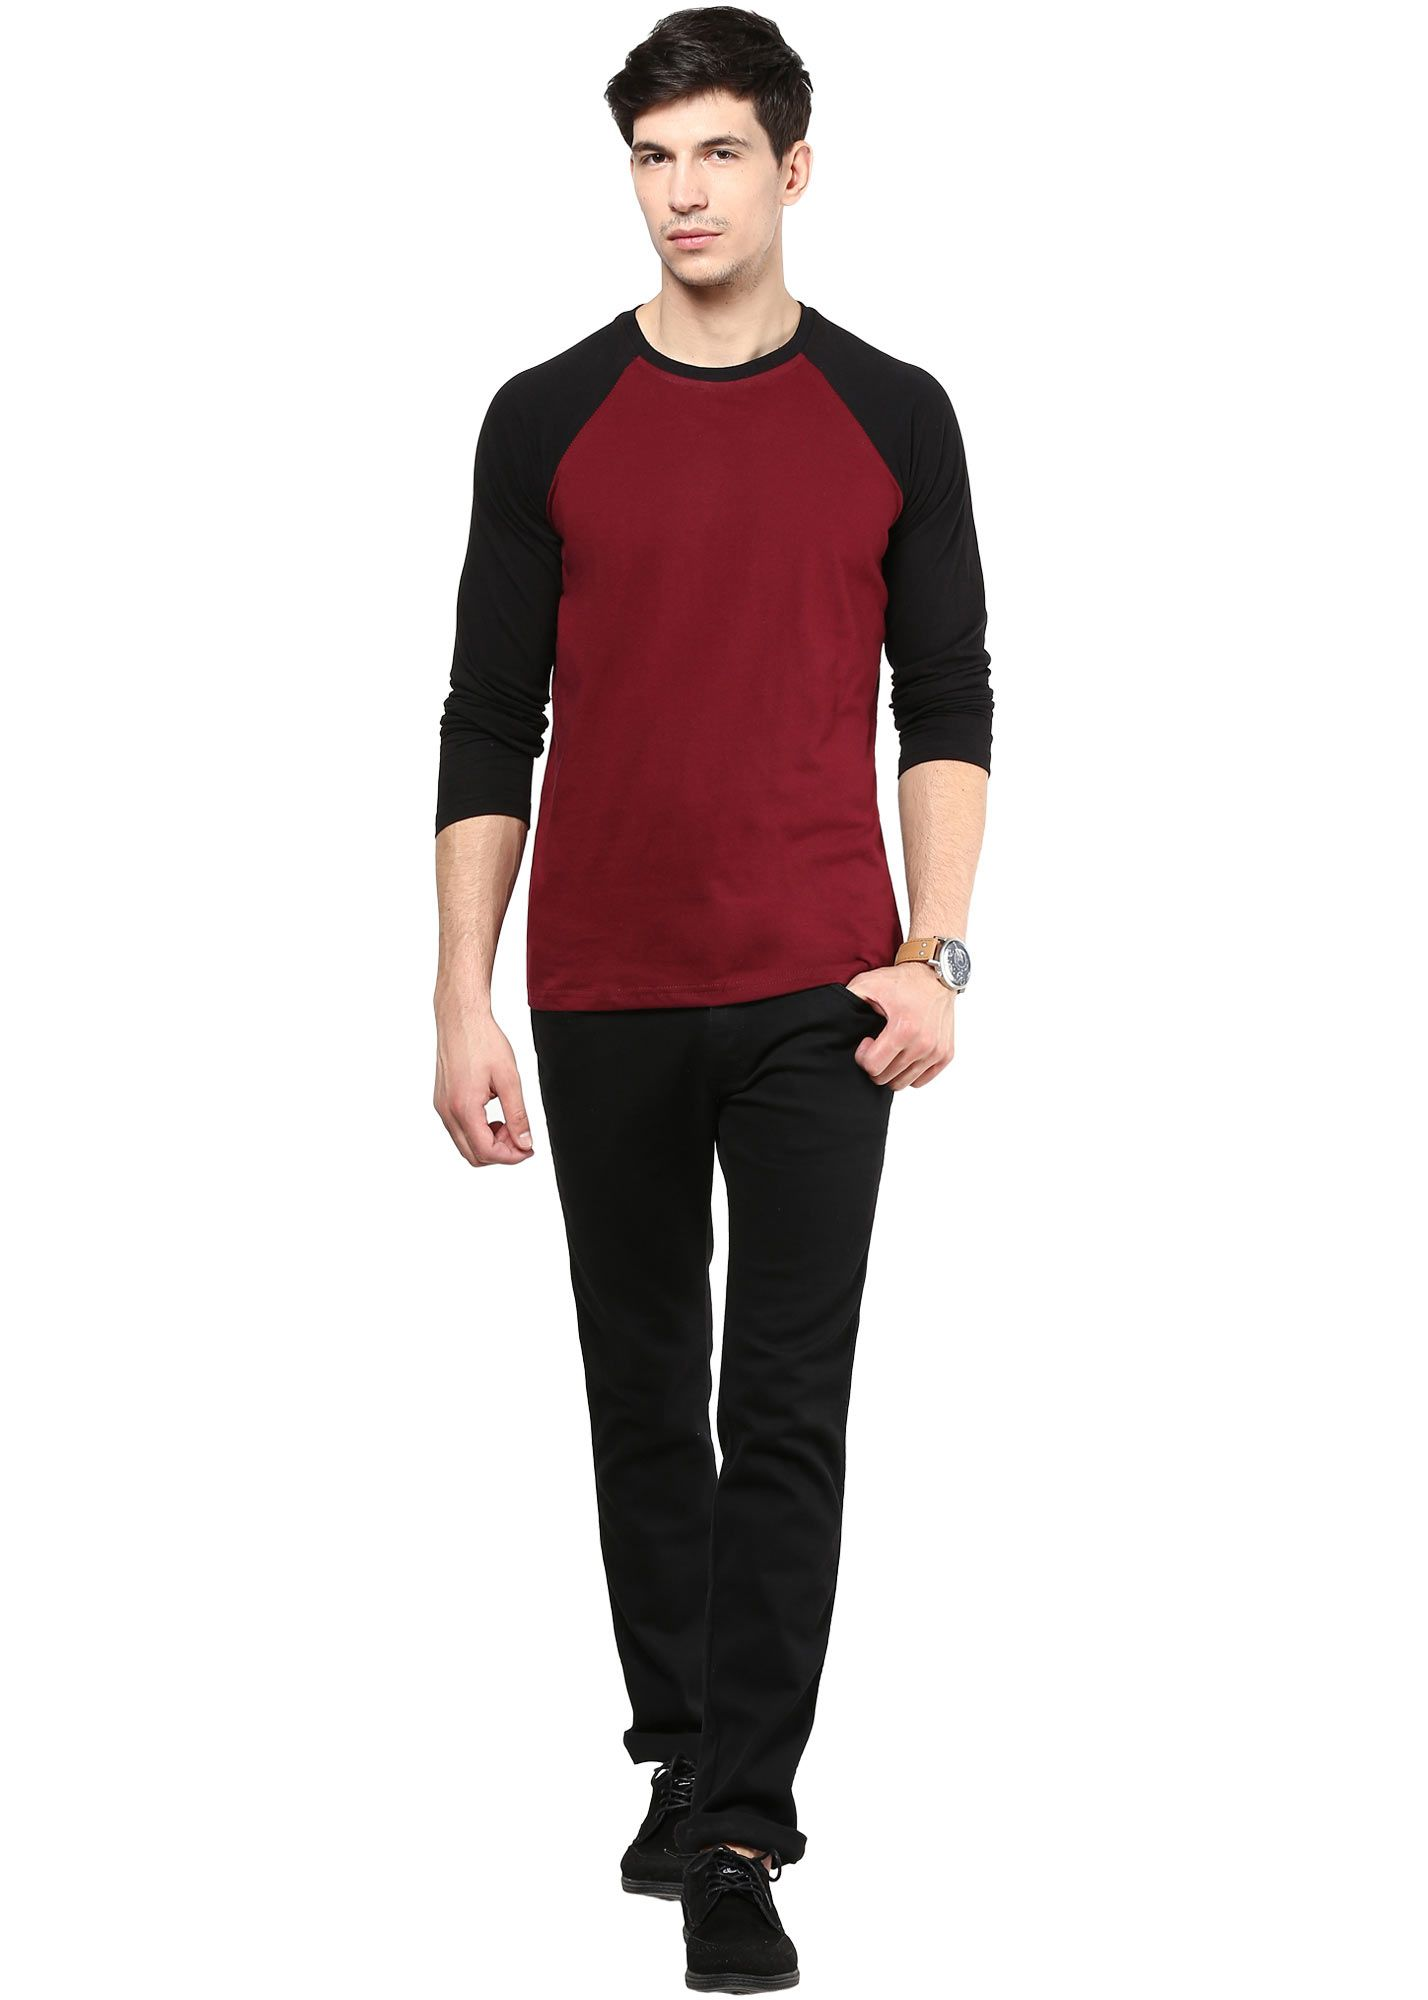 Izinc maroon reglan coloured full sleeve cotton t shirt for Maroon t shirt for men